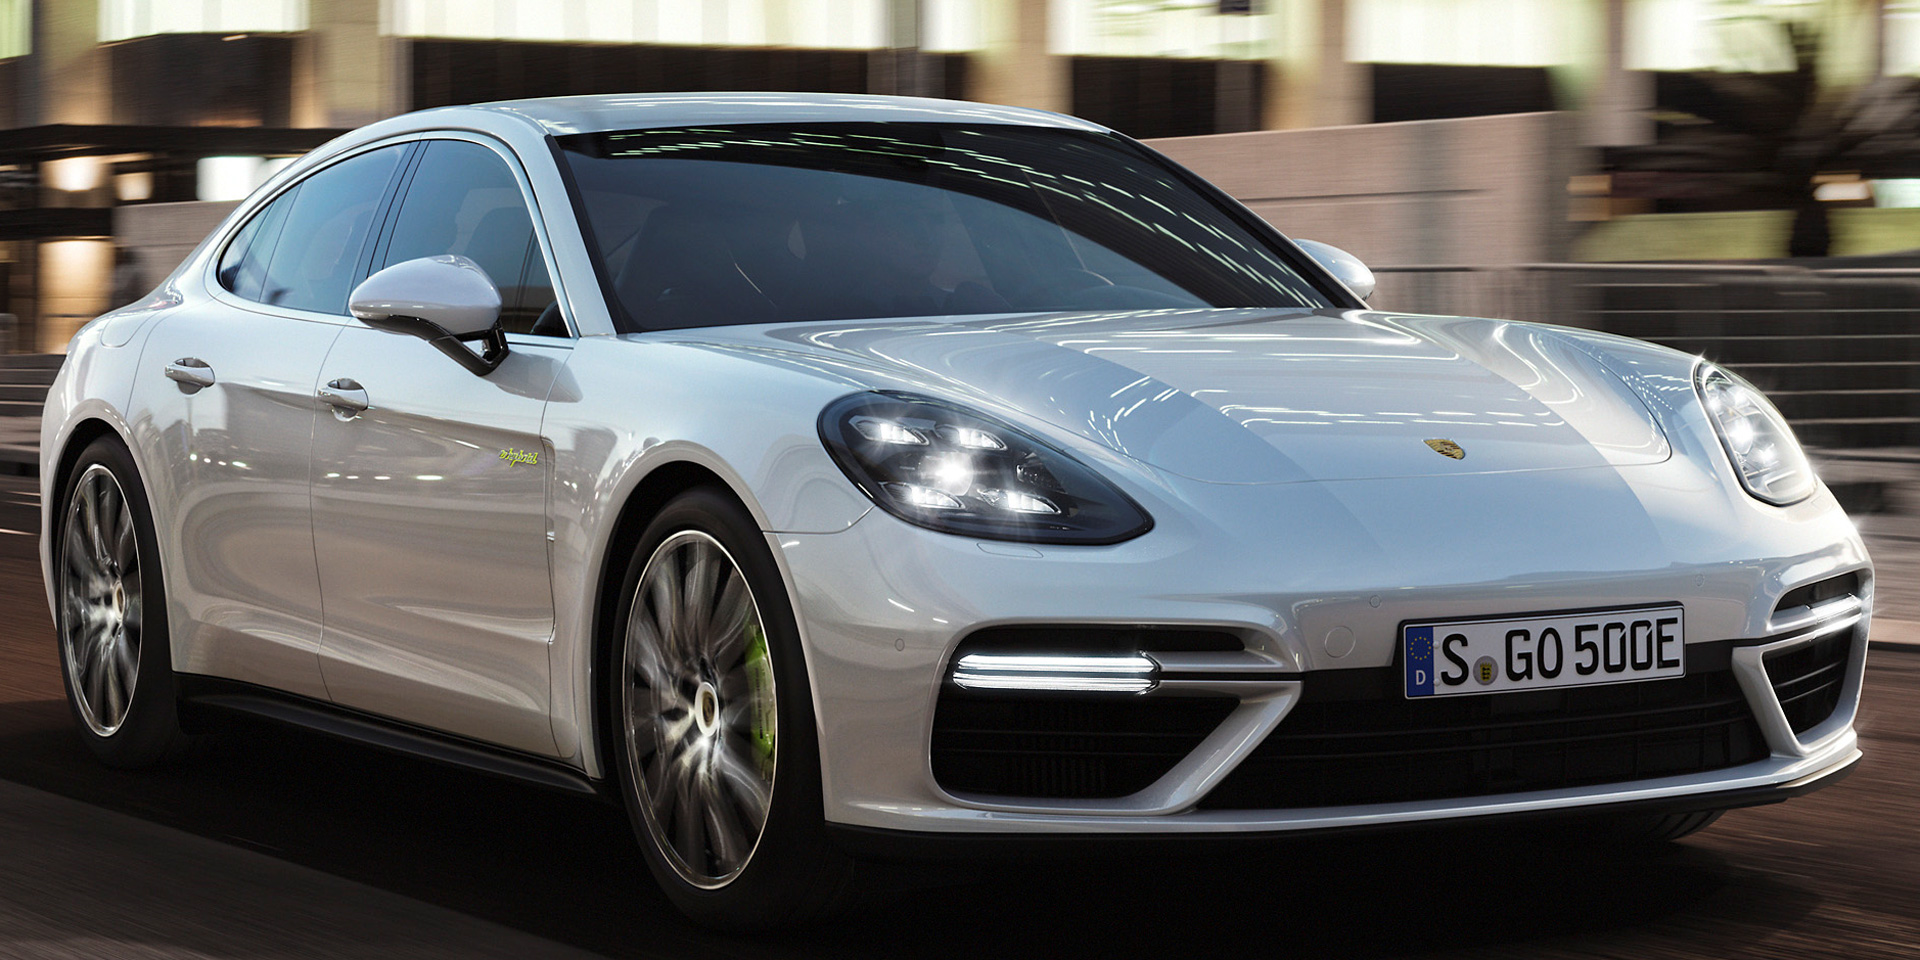 2018 Porsche Panamera Vehicles On Display Chicago